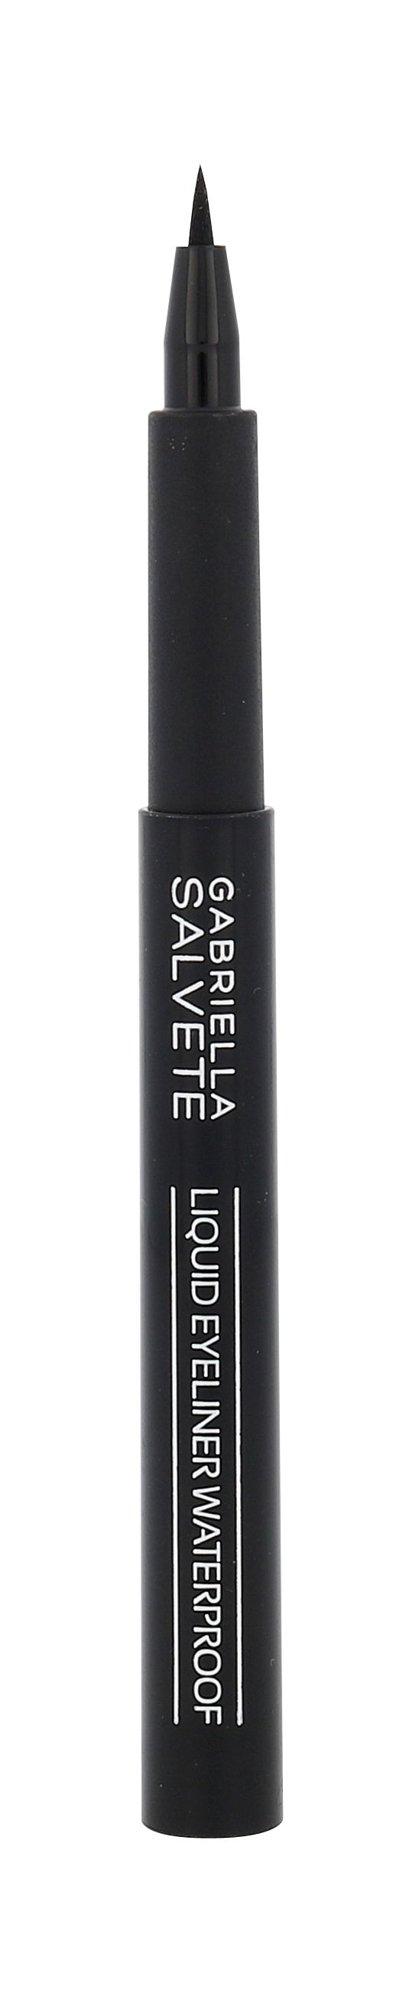 Gabriella Salvete Liquid Eyeliner Cosmetic 1,2ml 01